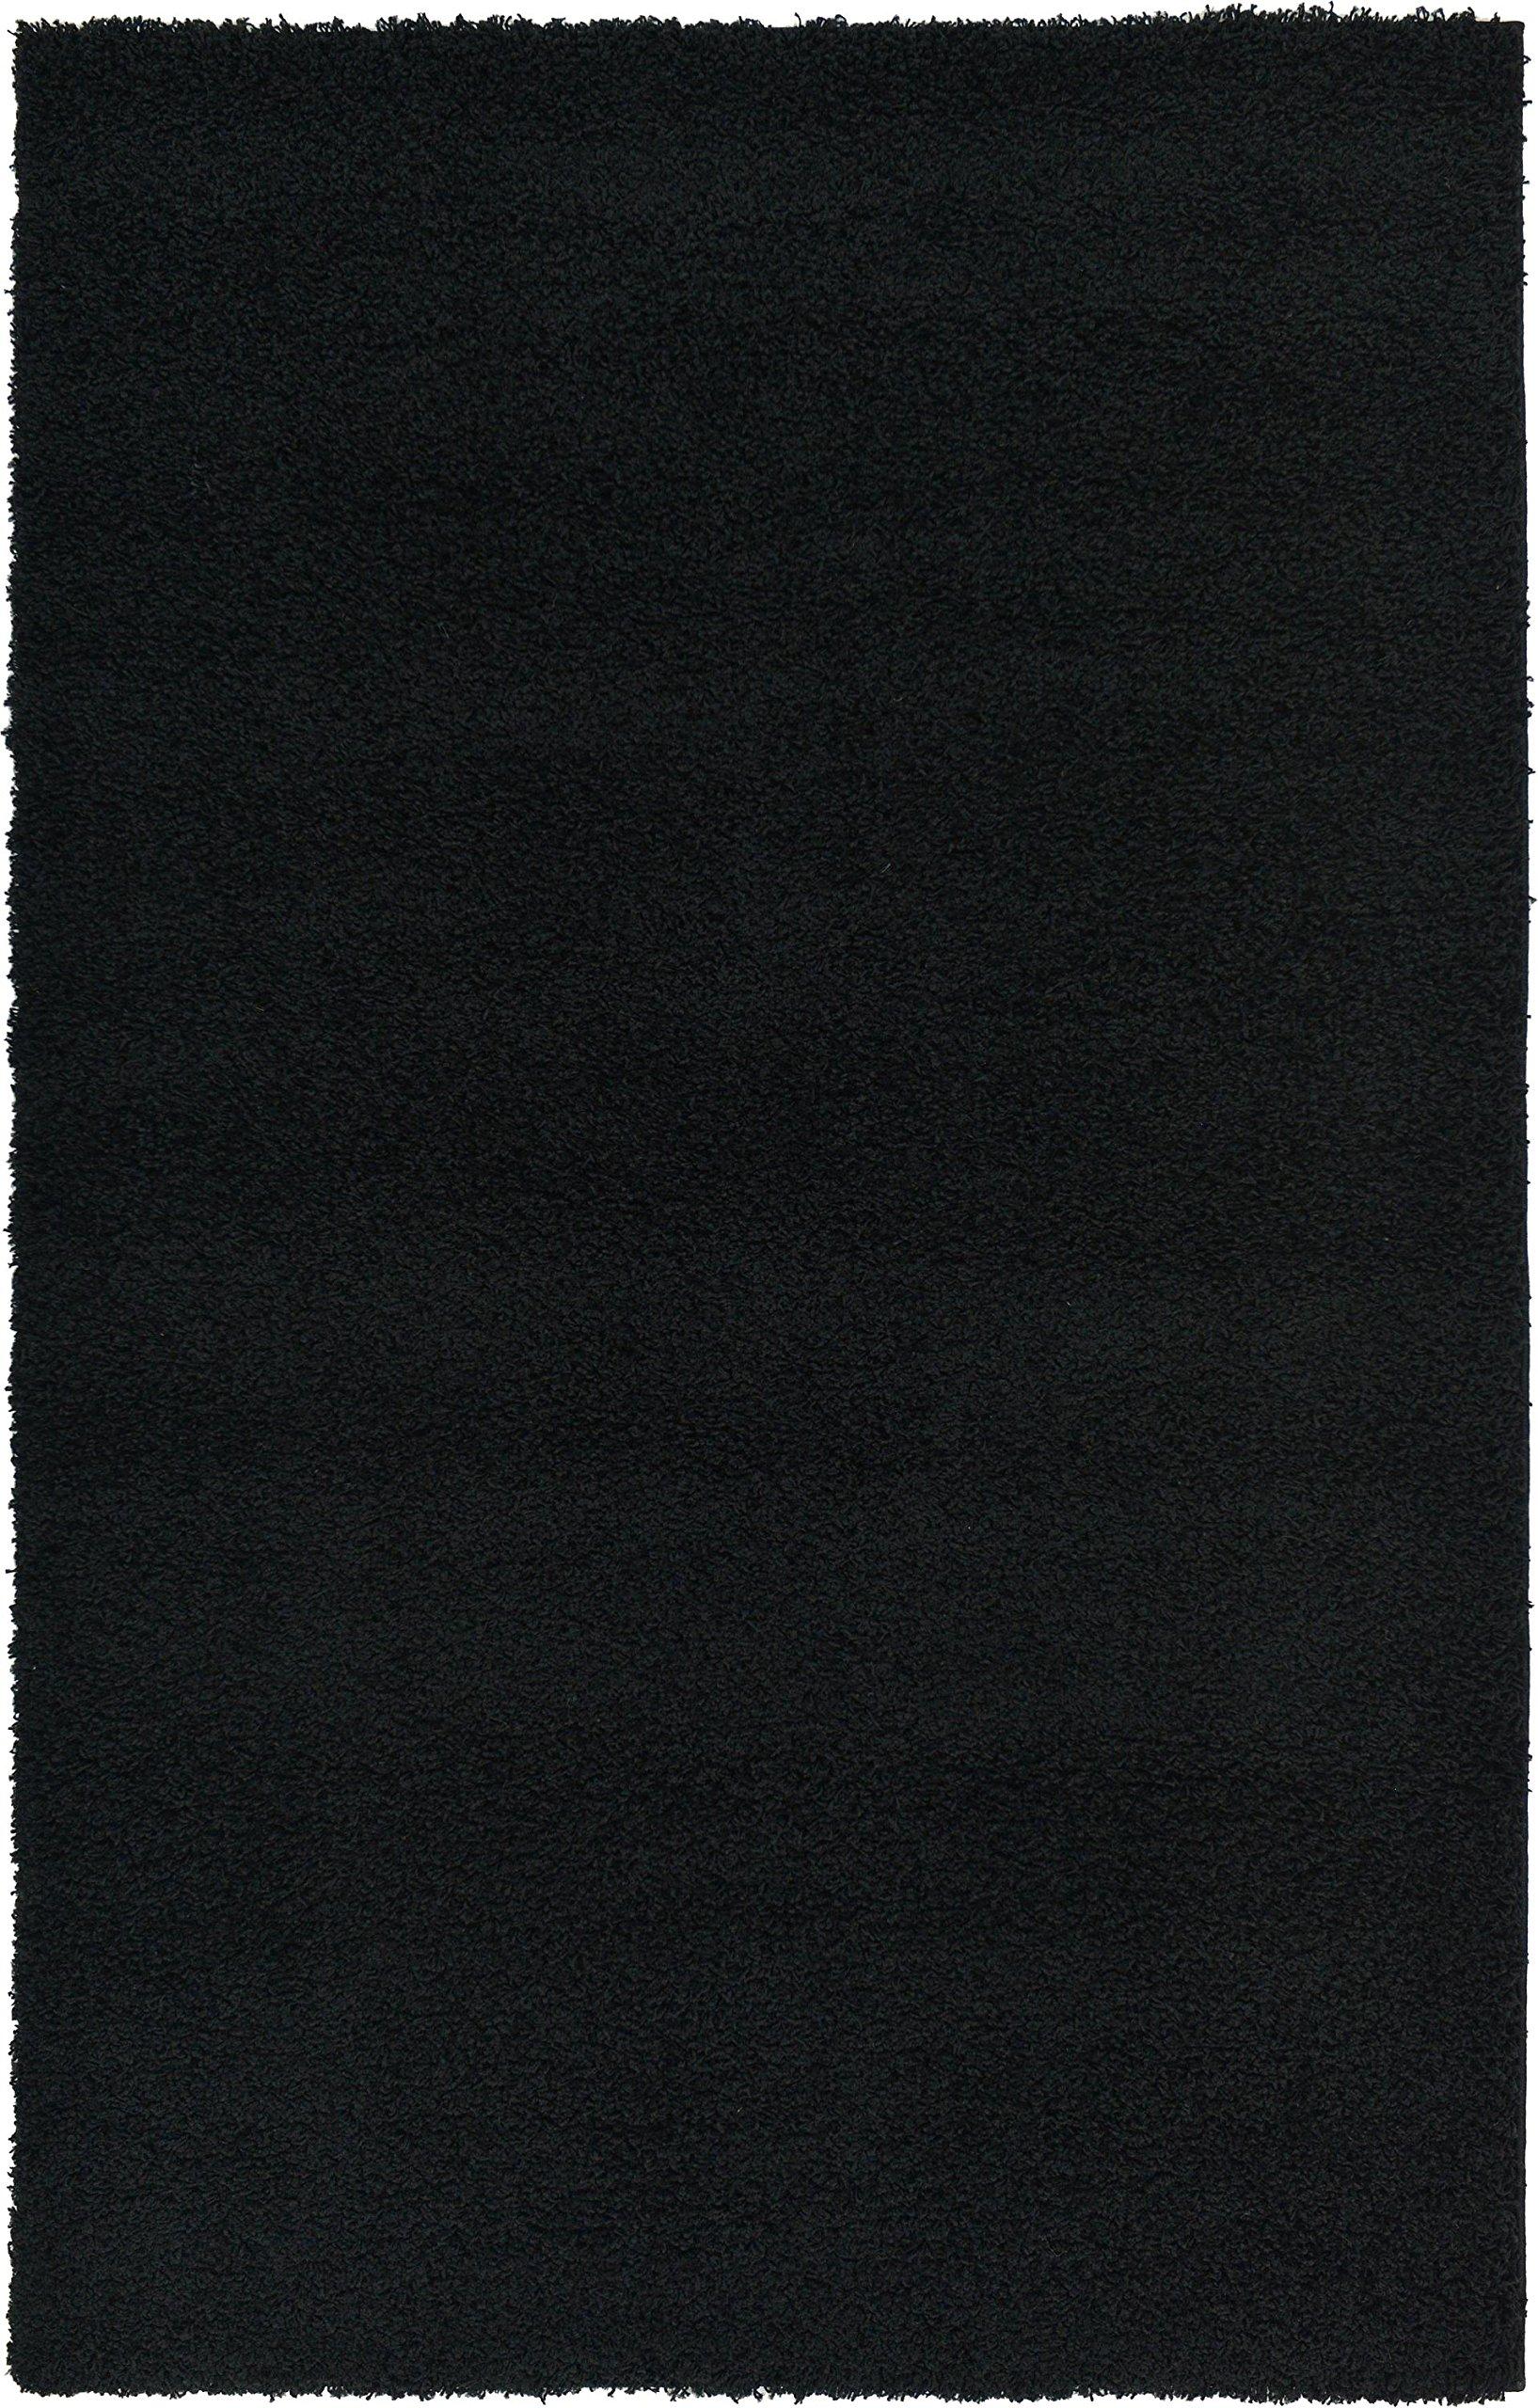 Unique Loom Solo Solid Shag Collection Modern Plush Jet Black Rectangle (5' x 8') by Unique Loom (Image #11)